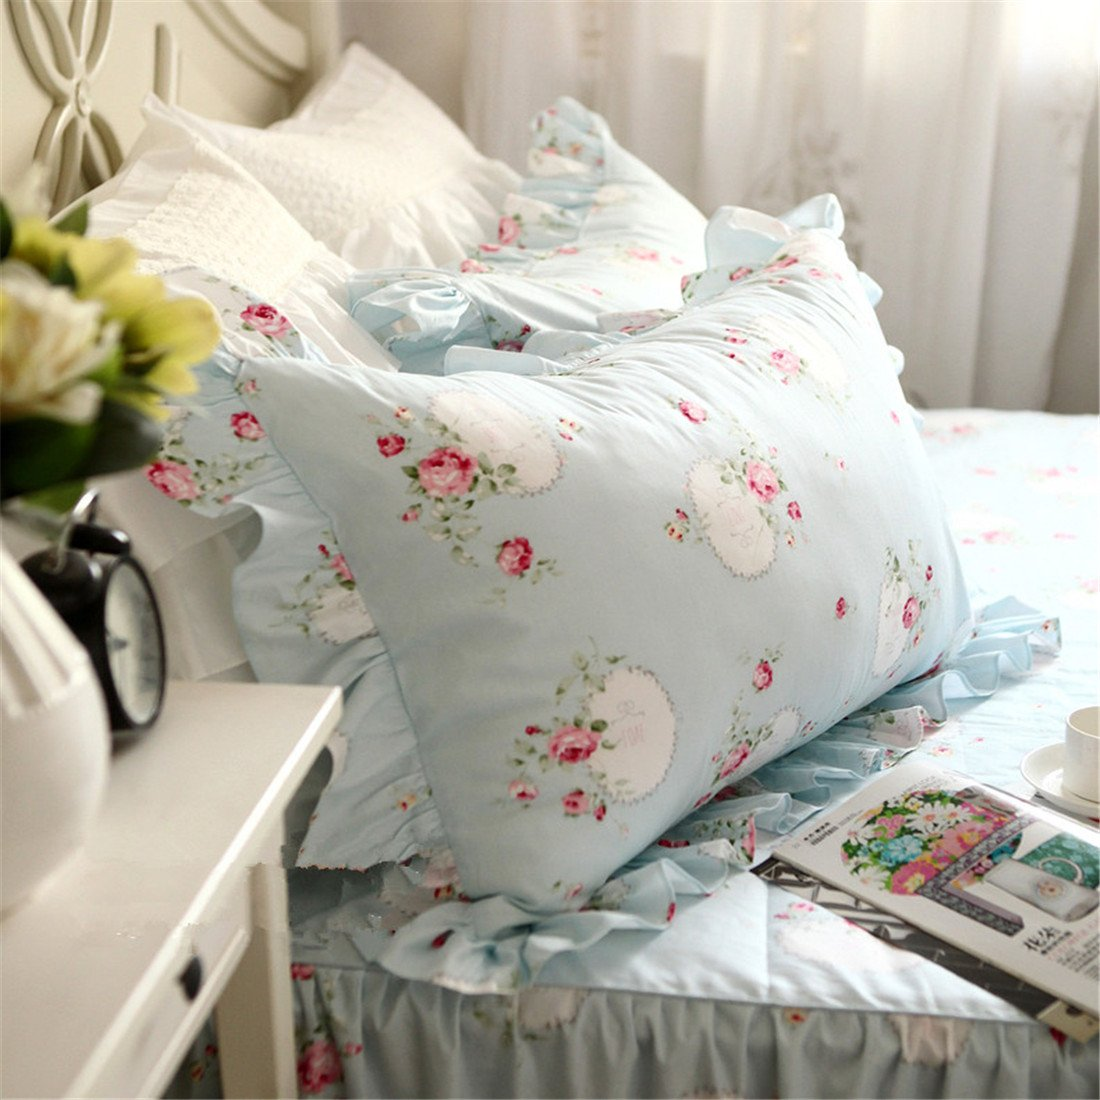 Lotus Karen 100%Cotton Blue Pastoral Flowers 4PC Floral Bed Sheet Set Ruffles Korean Bedding Set With Romantic Love Letters Patterns For Wedding Bedding King,1Duvet Cover,1Bedskirt,2Pillowcases by Lotus Karen (Image #6)